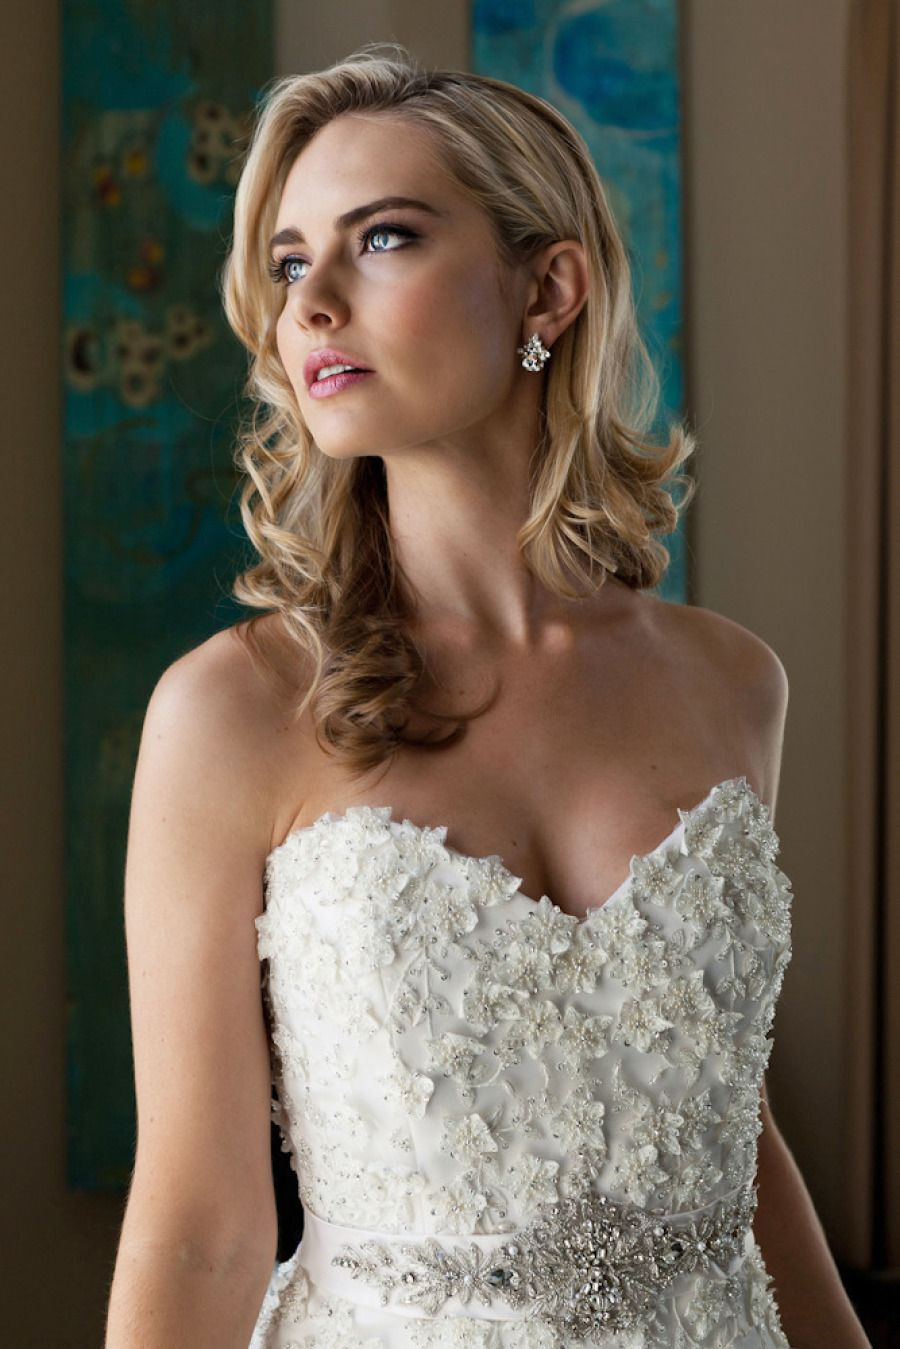 Cinderella inspired wedding dress  A Modern Cinderella Inspired Photo Shoot from Anza Foto  Film